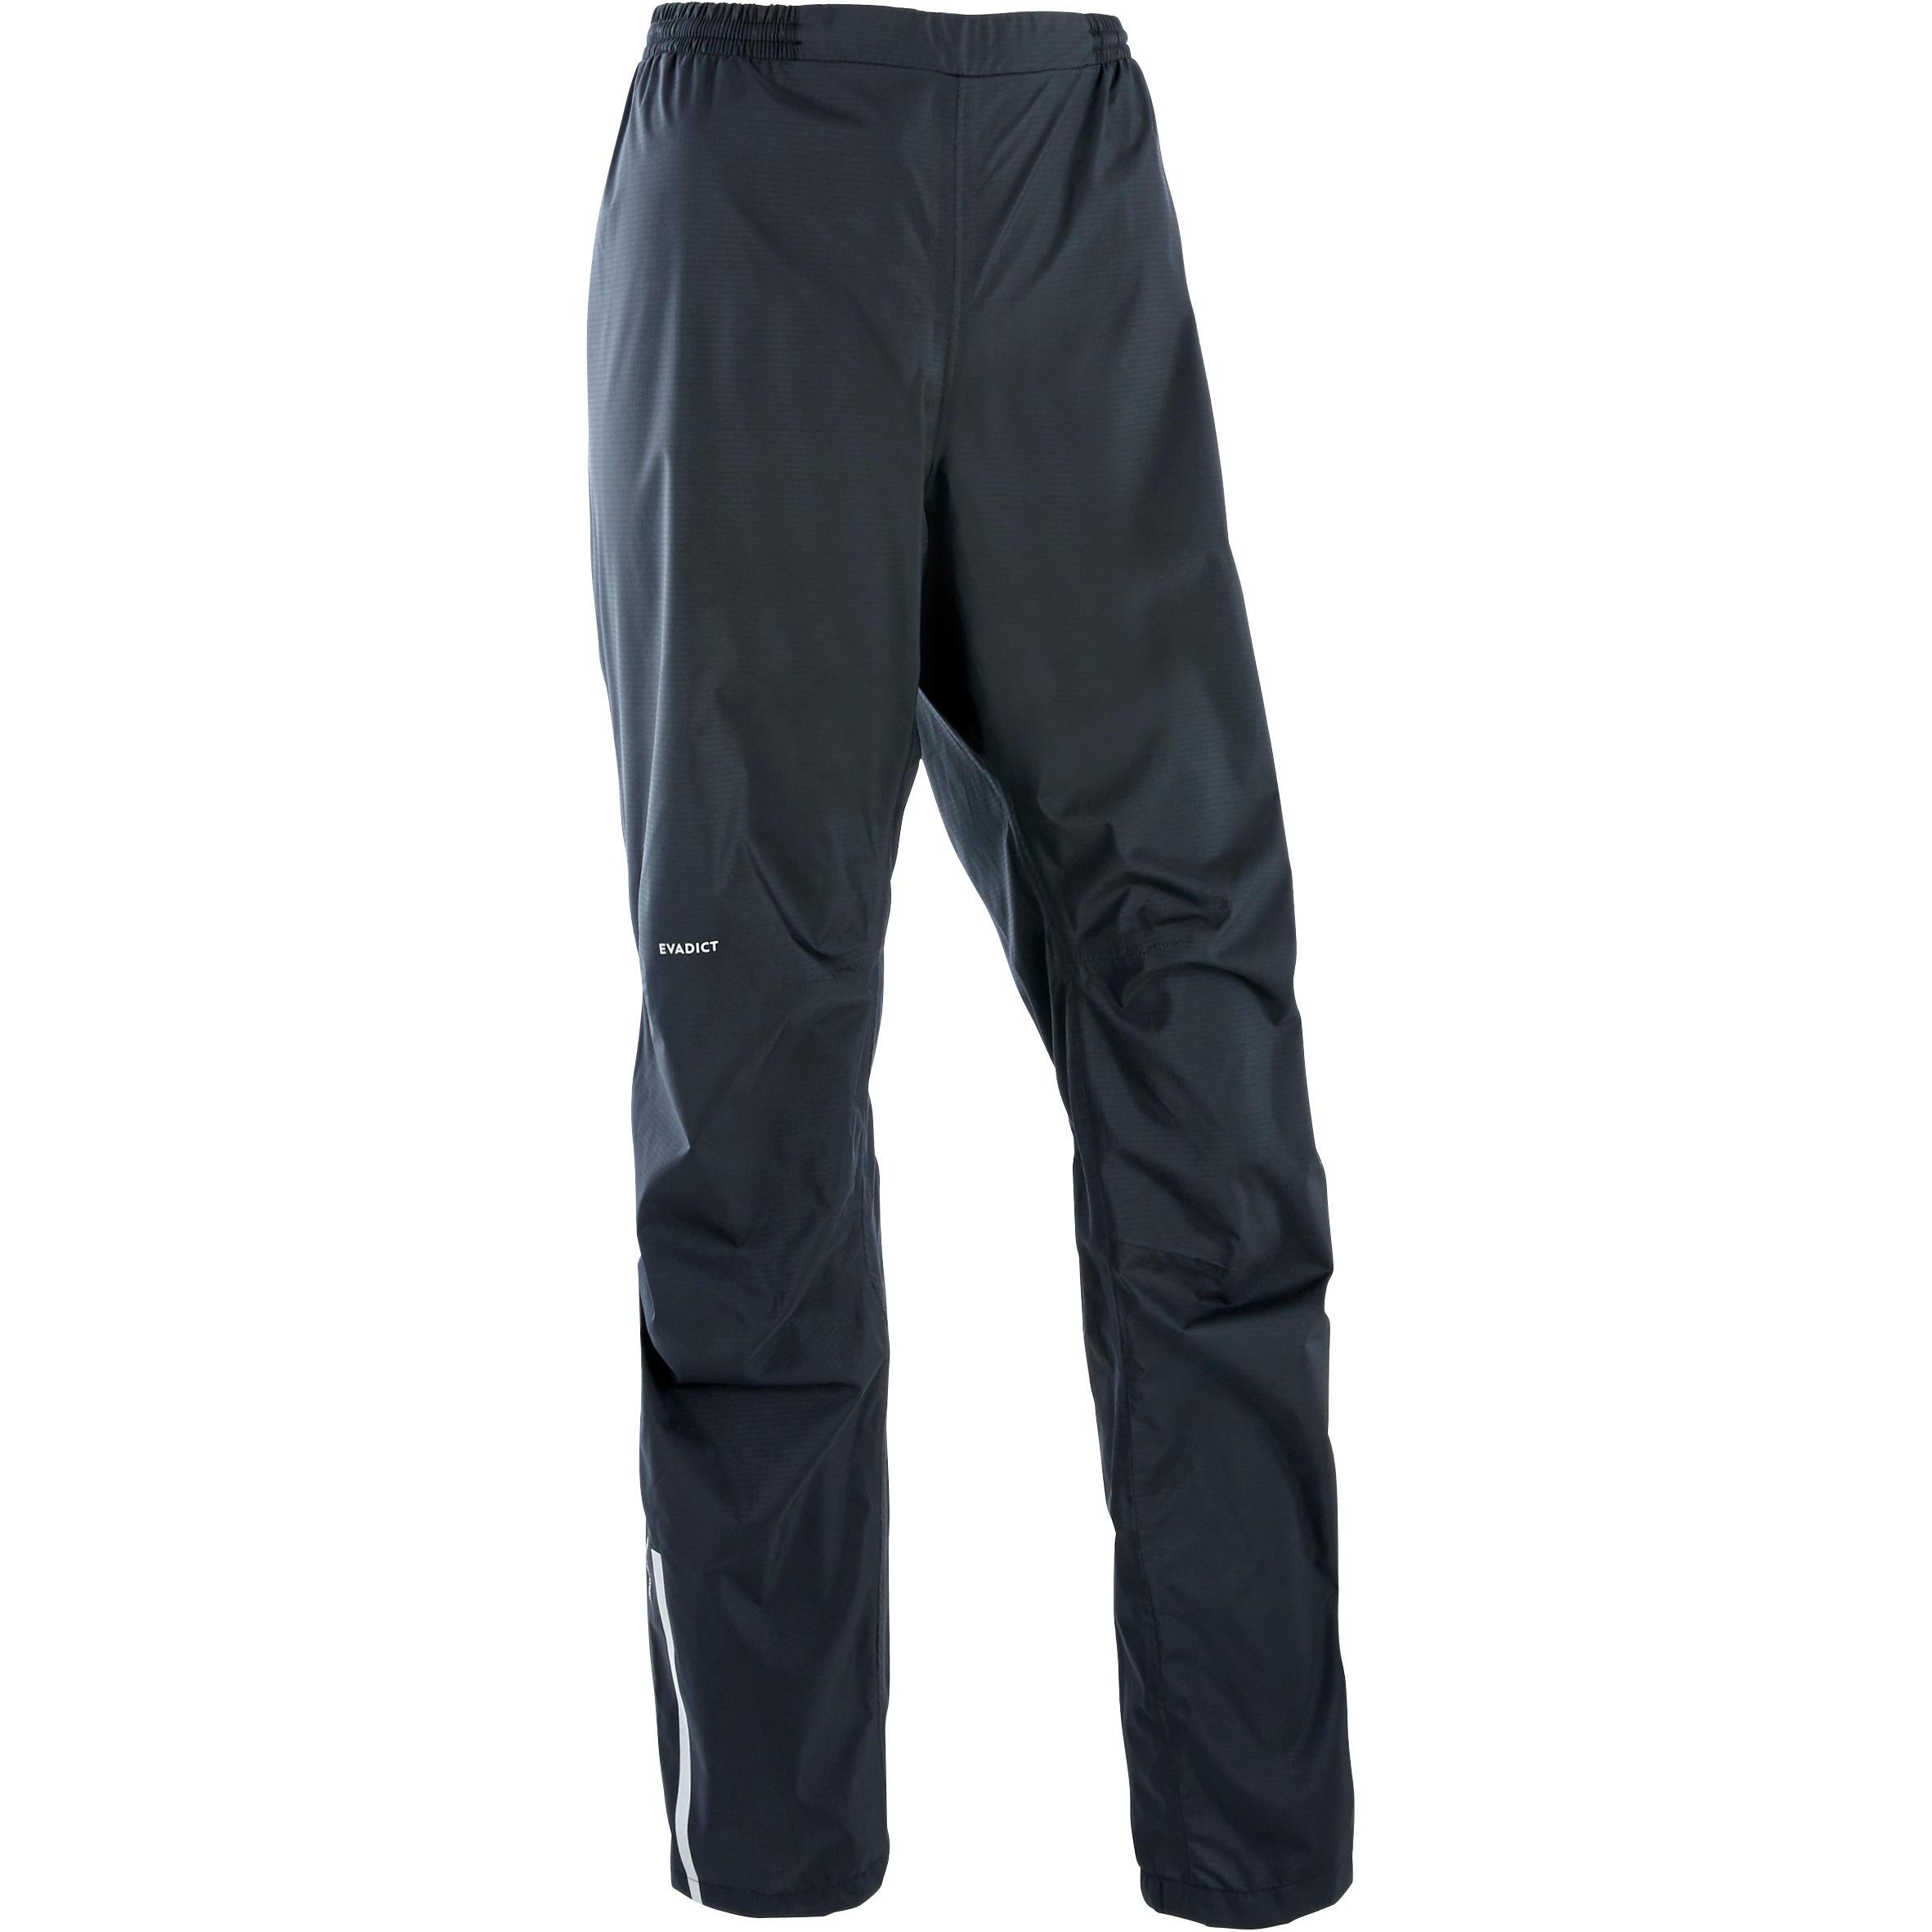 Pantalon imperméable trail running femme noir kalenji